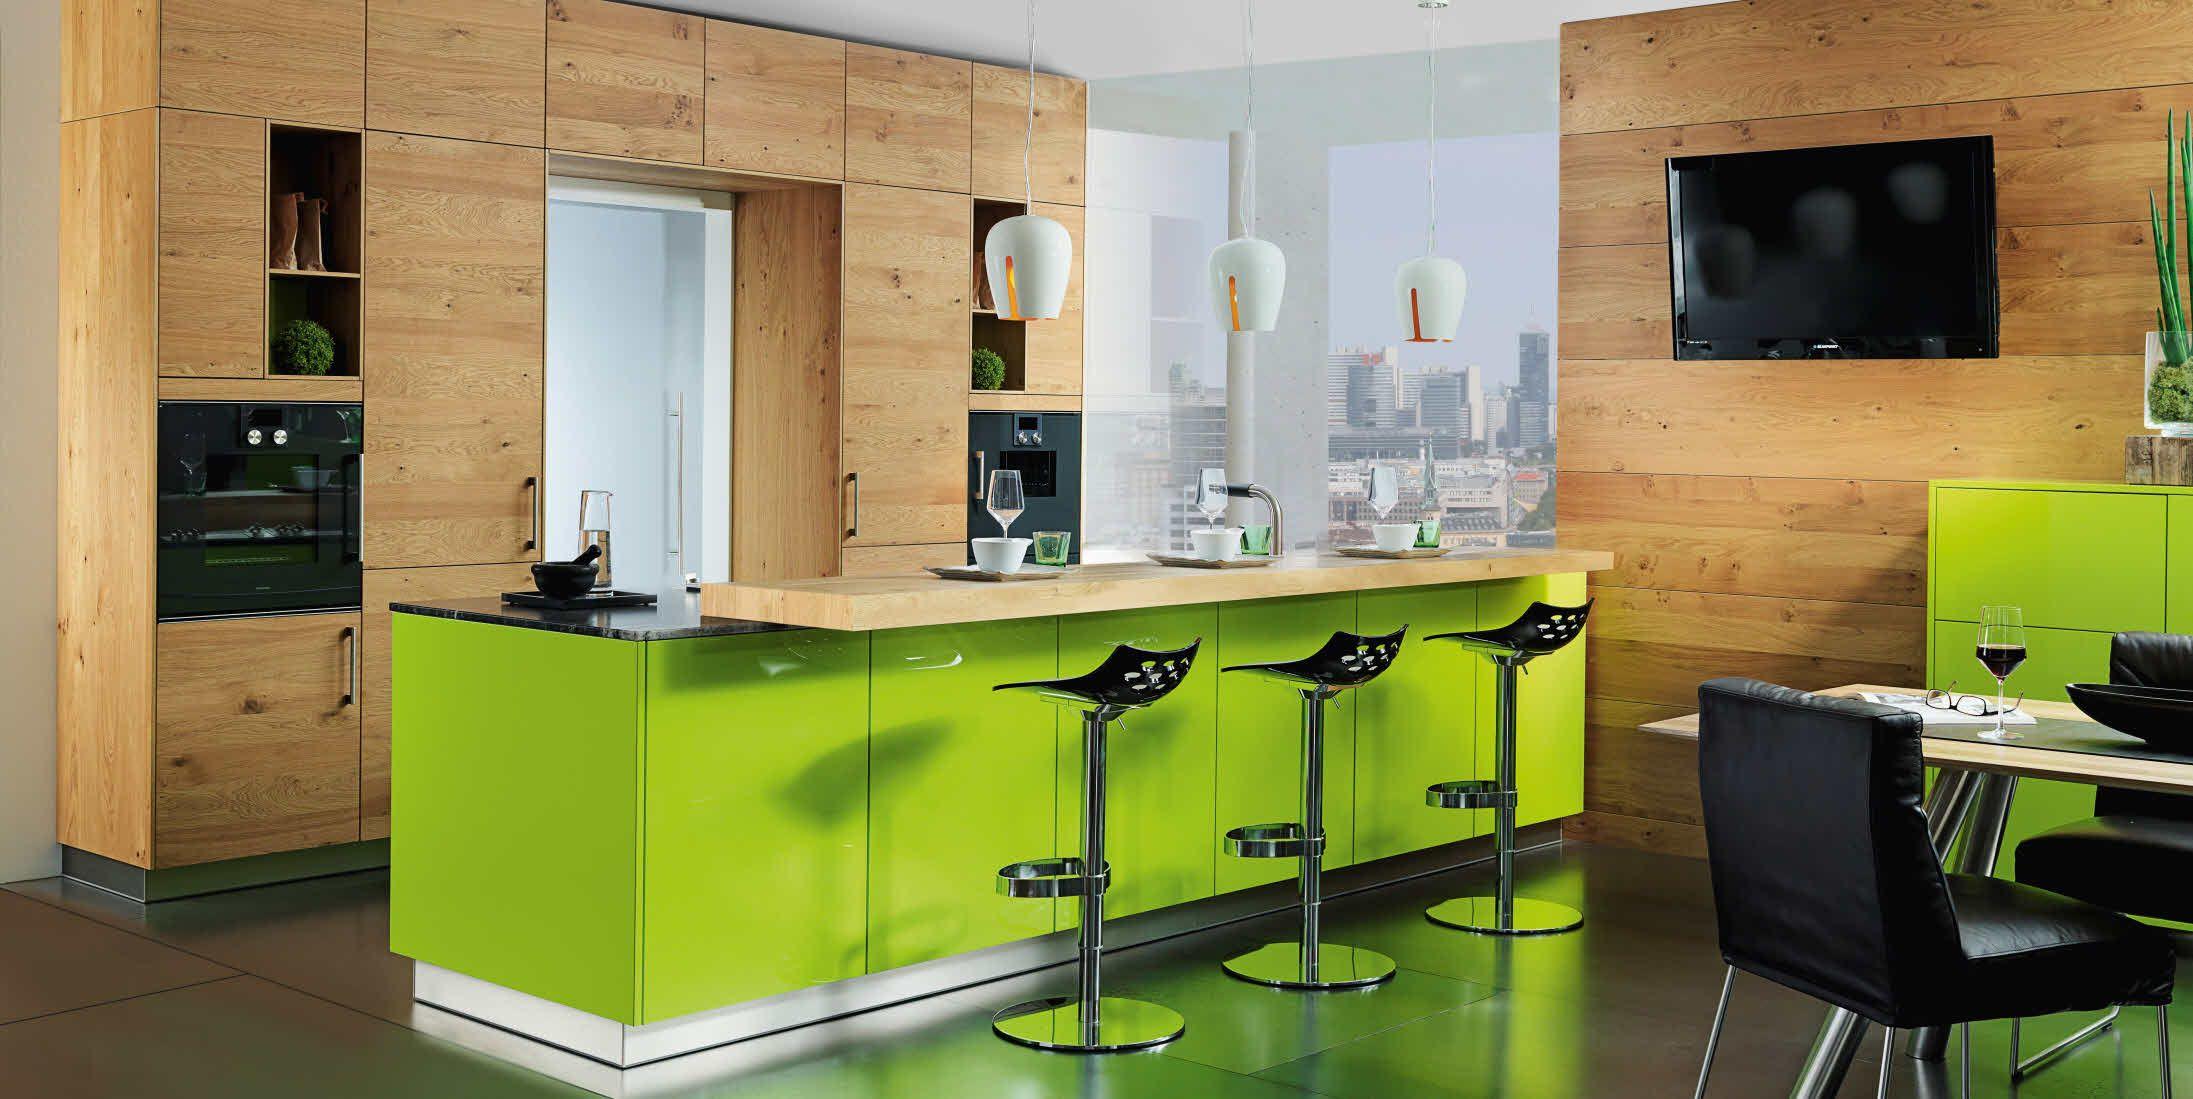 Lucca in der Trendfarbe lime green | Küchen Inspiration | Pinterest ...